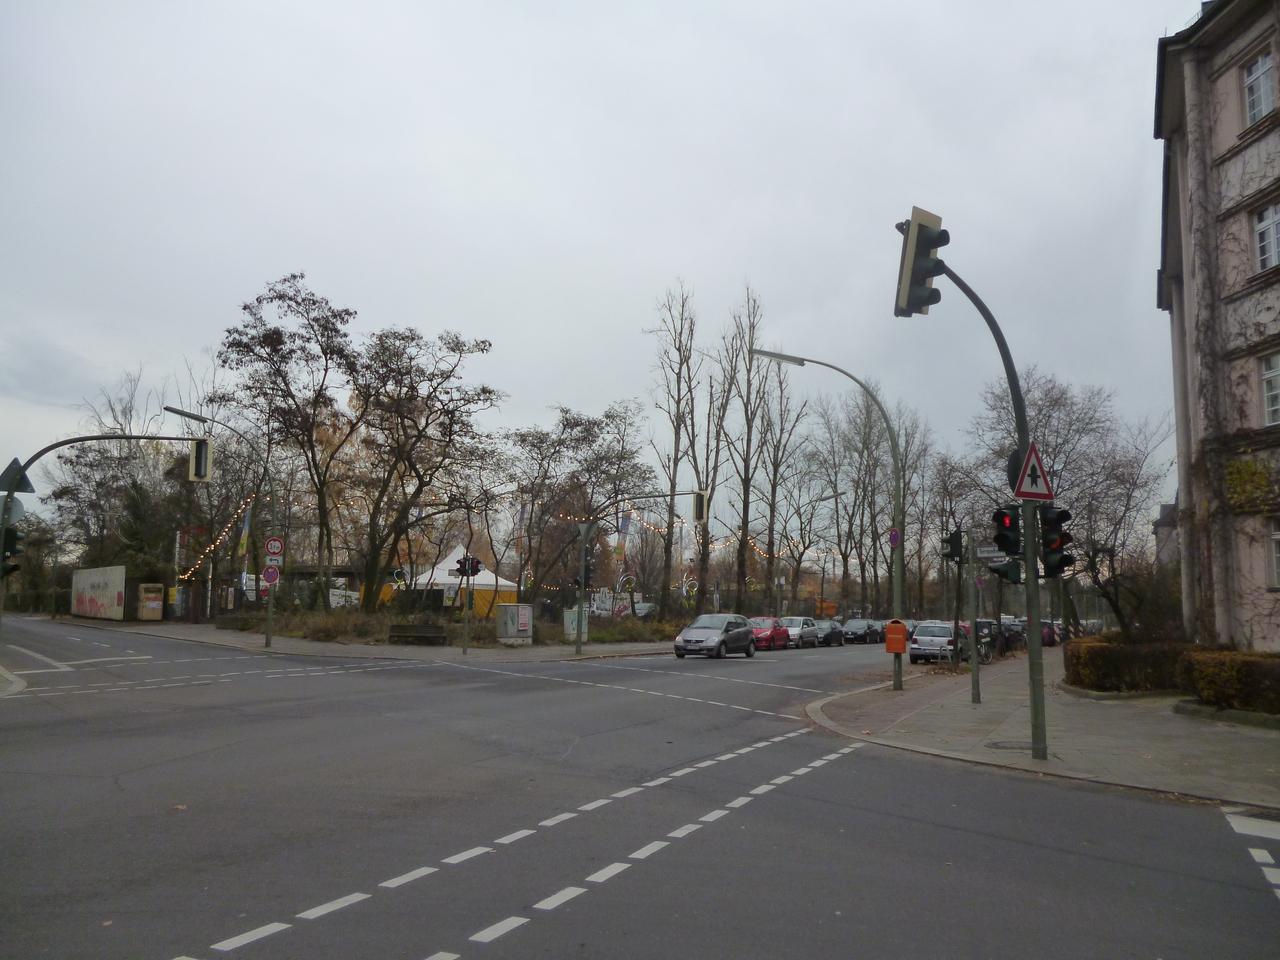 gotenstrasse-tempelholar6a.jpg